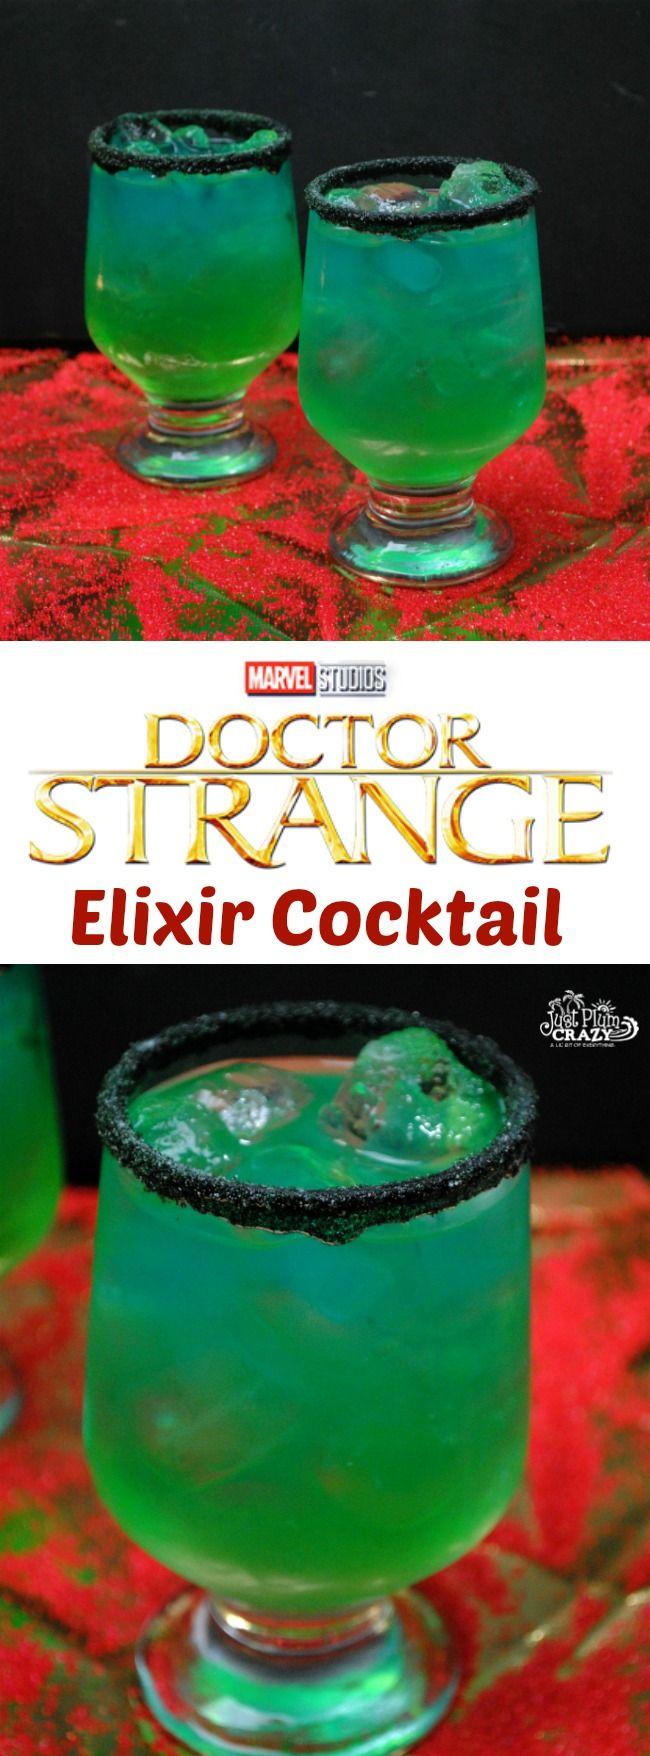 Photo of Dr. Strange Elixir Cocktail Recipe #DoctorStrange | Be Plum Crazy!